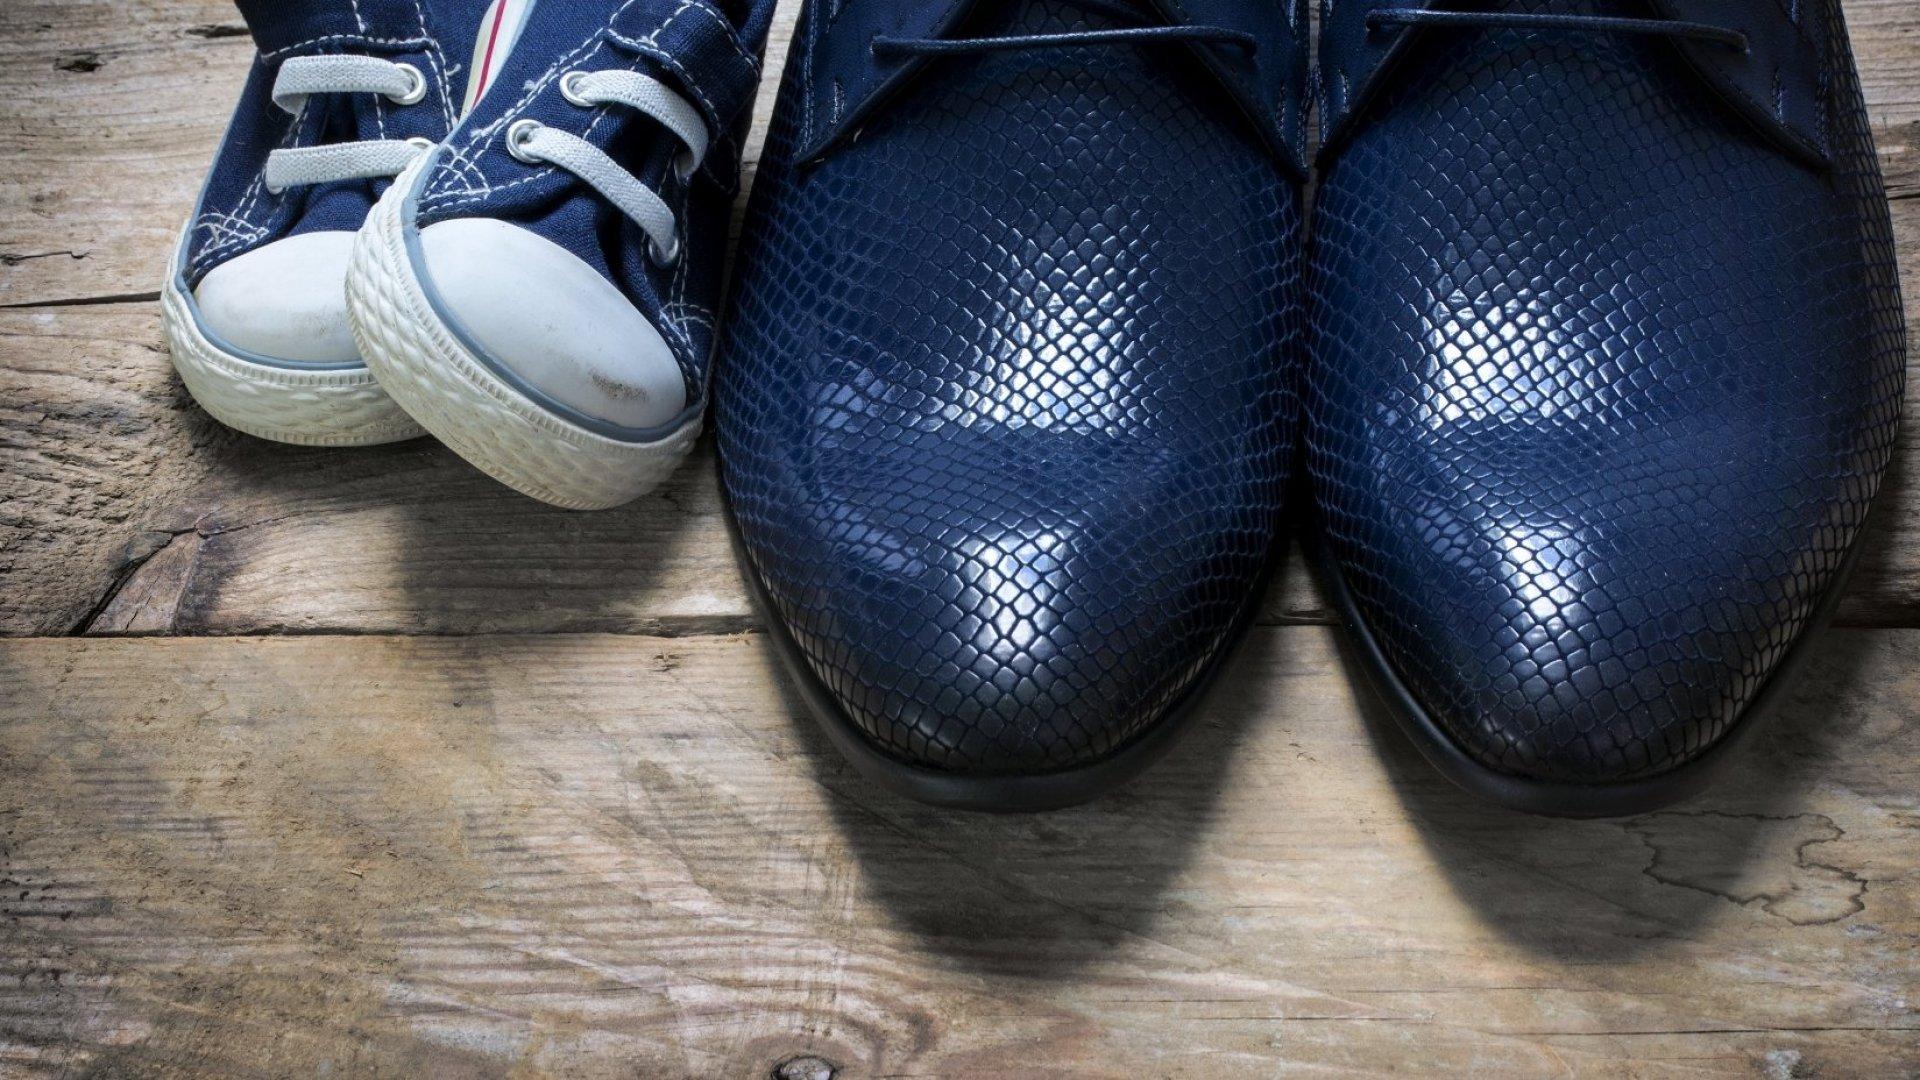 How Becoming aDad Overhauled My Business Model, Twice